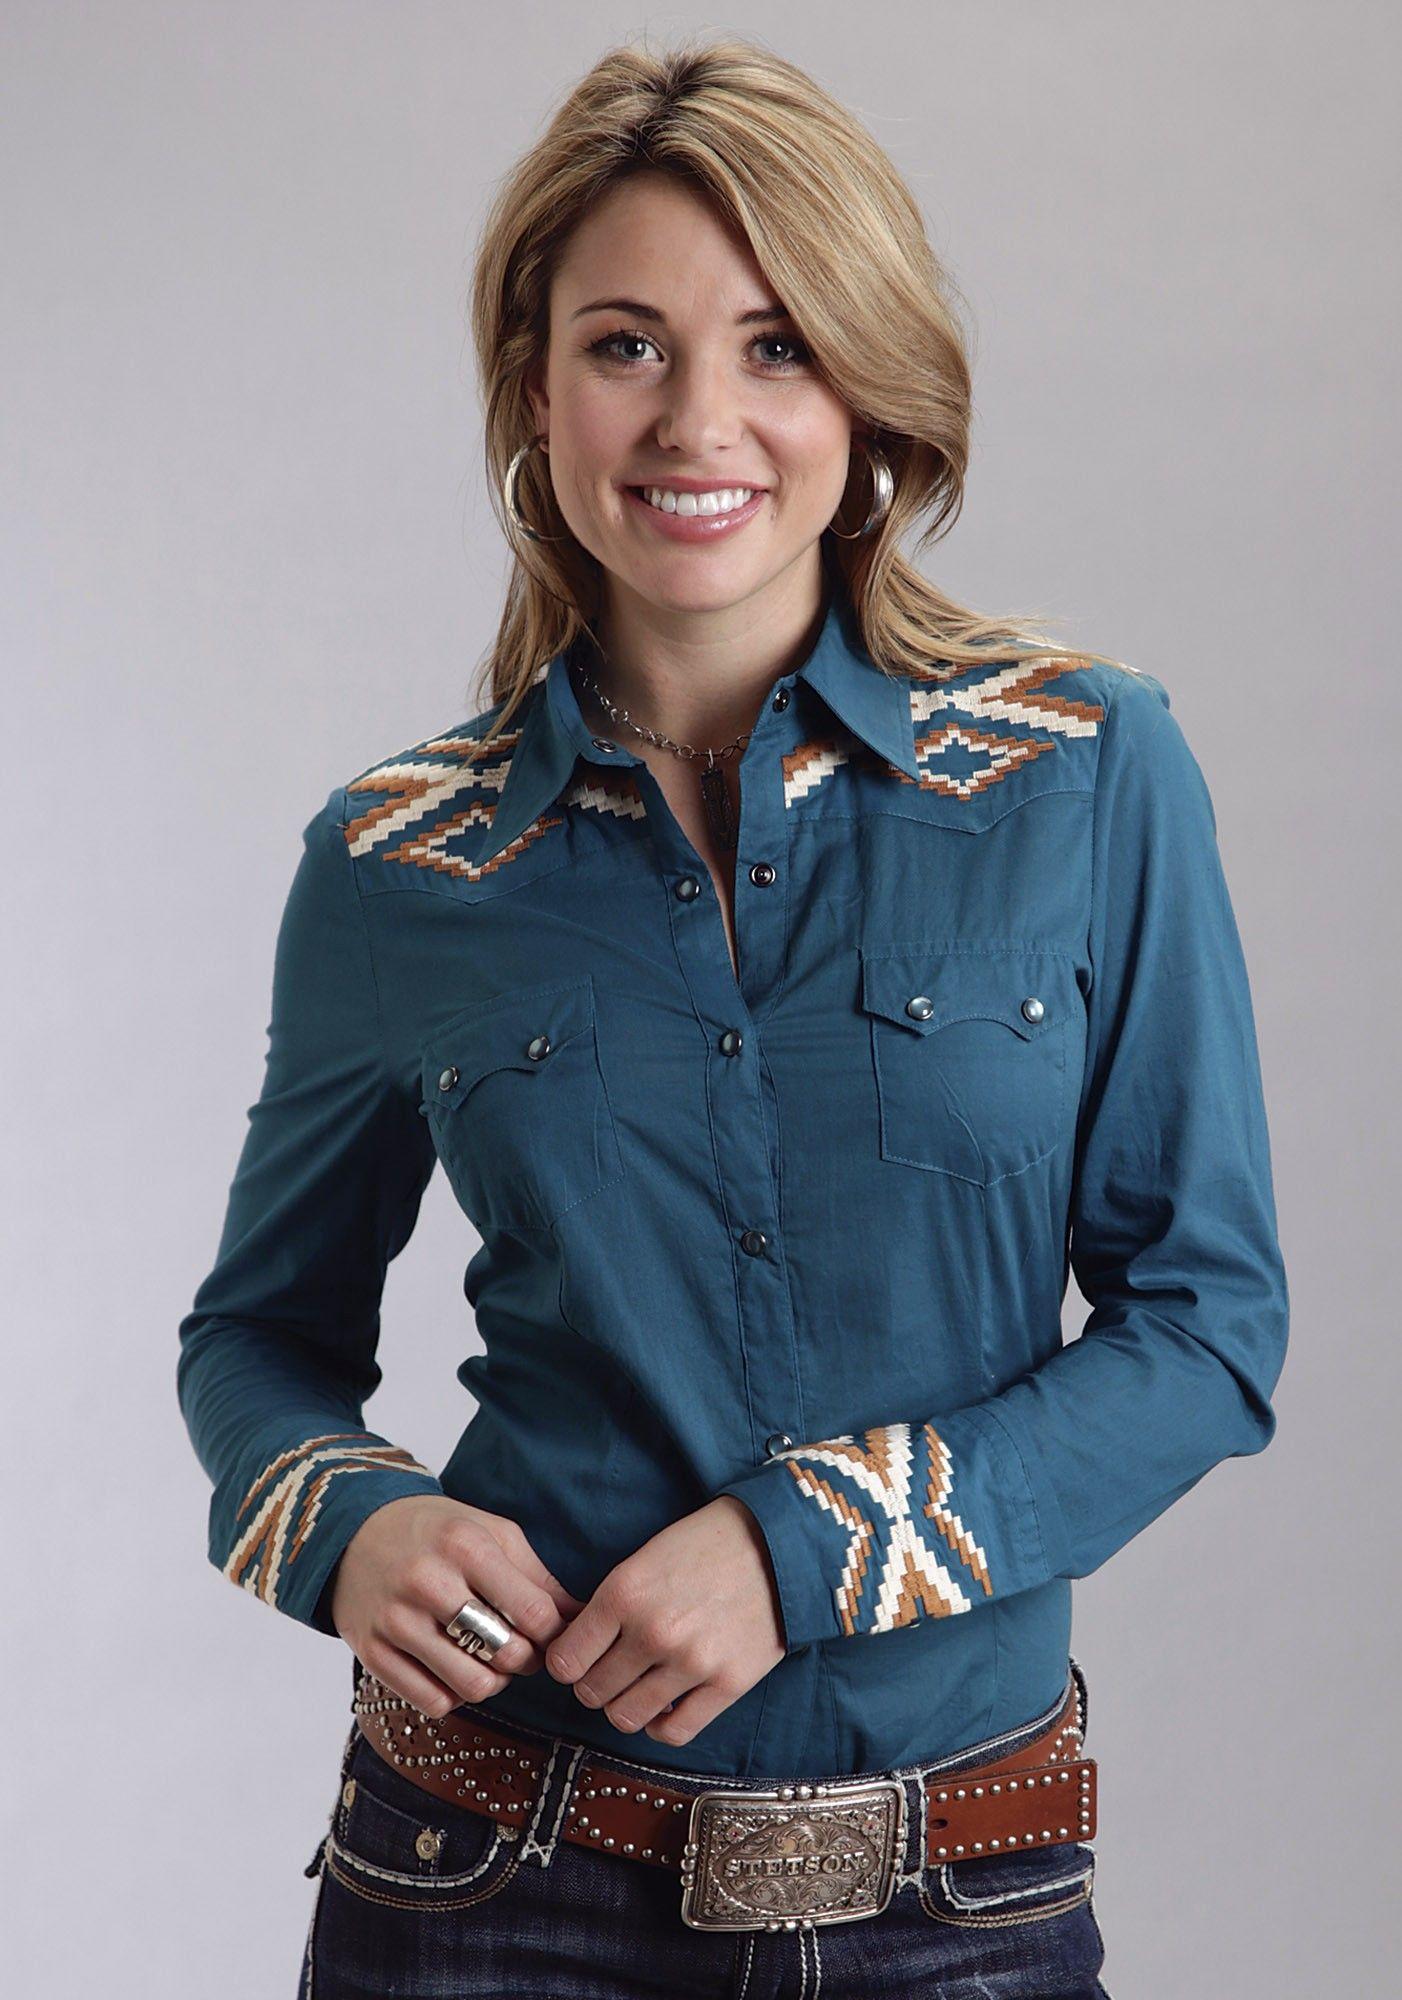 Stetson® Women s Teal Embroidered Yoke Long Sleeve Snap Western Shirt ceaf4d8447009